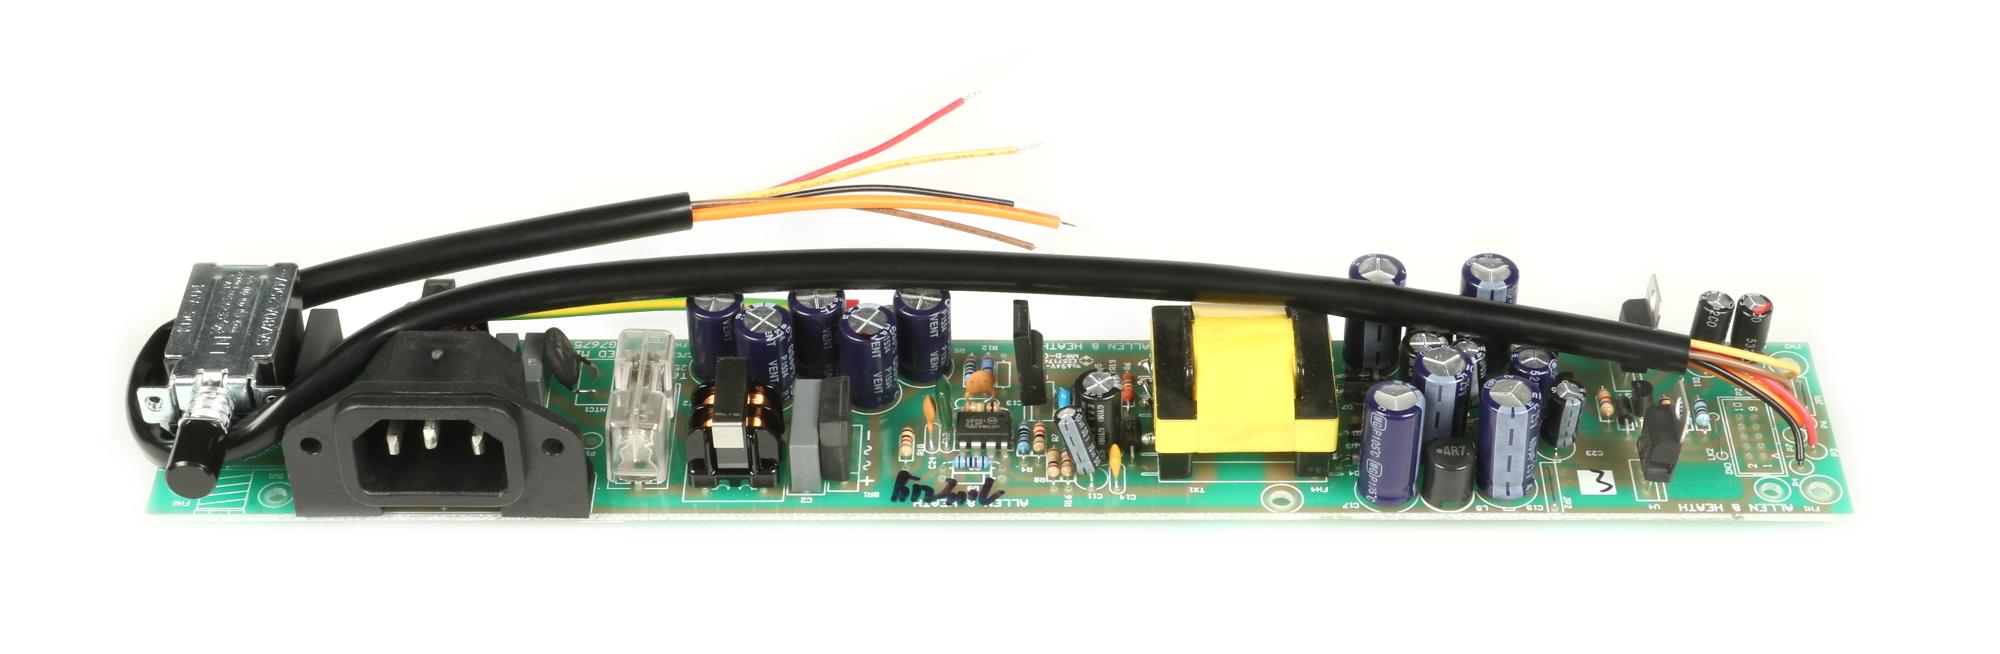 PSU PCB for ZED-10FX